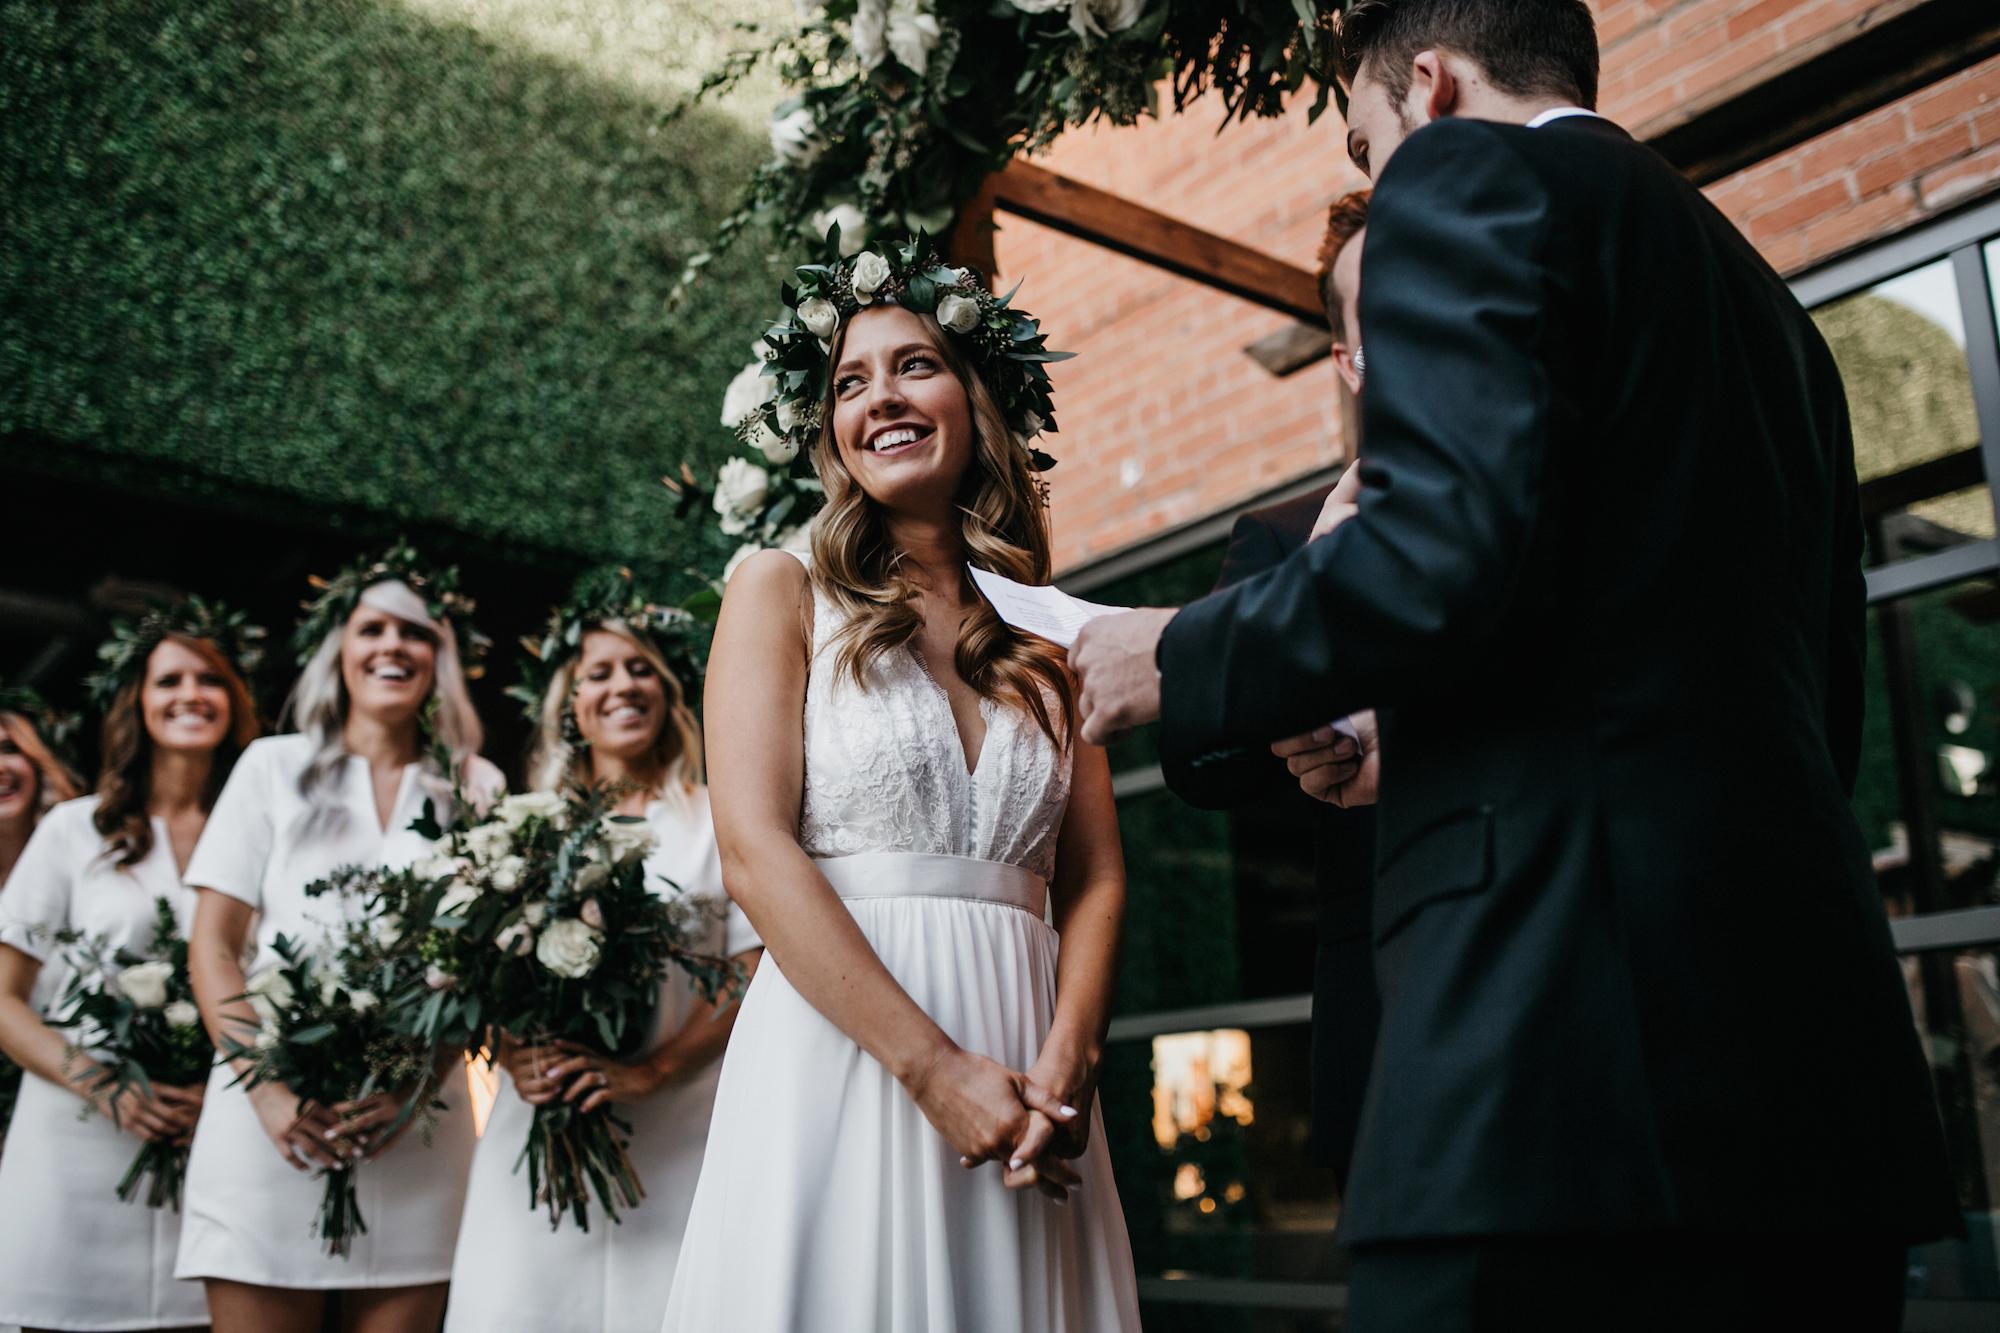 arizona - wedding - photographer 396.jpg